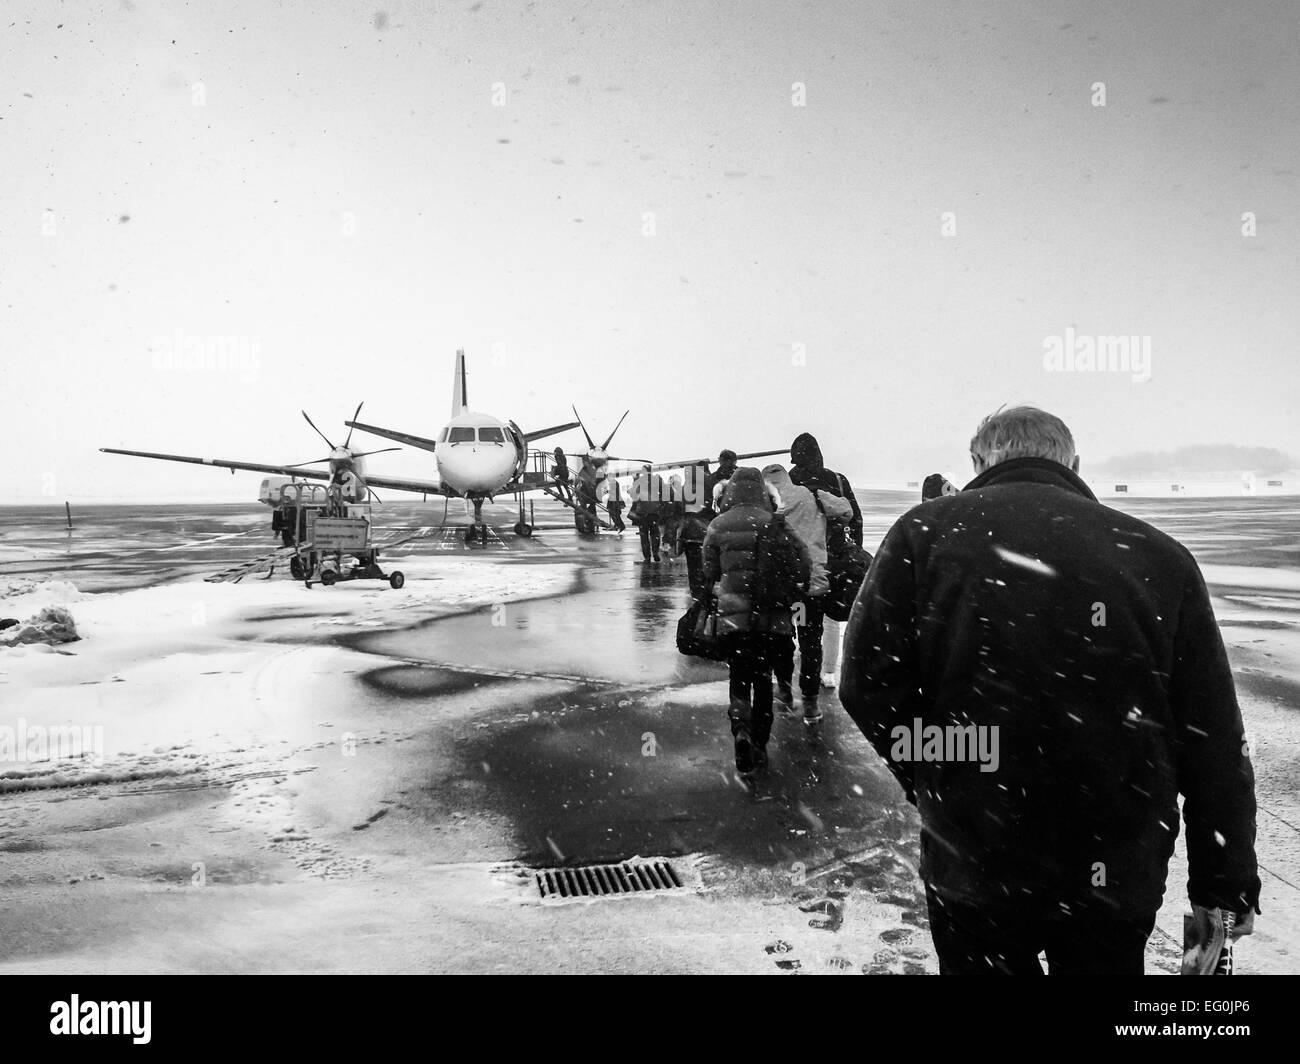 Sweden, Kalmar, Kalmar Airport, Passengers boarding small airplane in winter - Stock Image